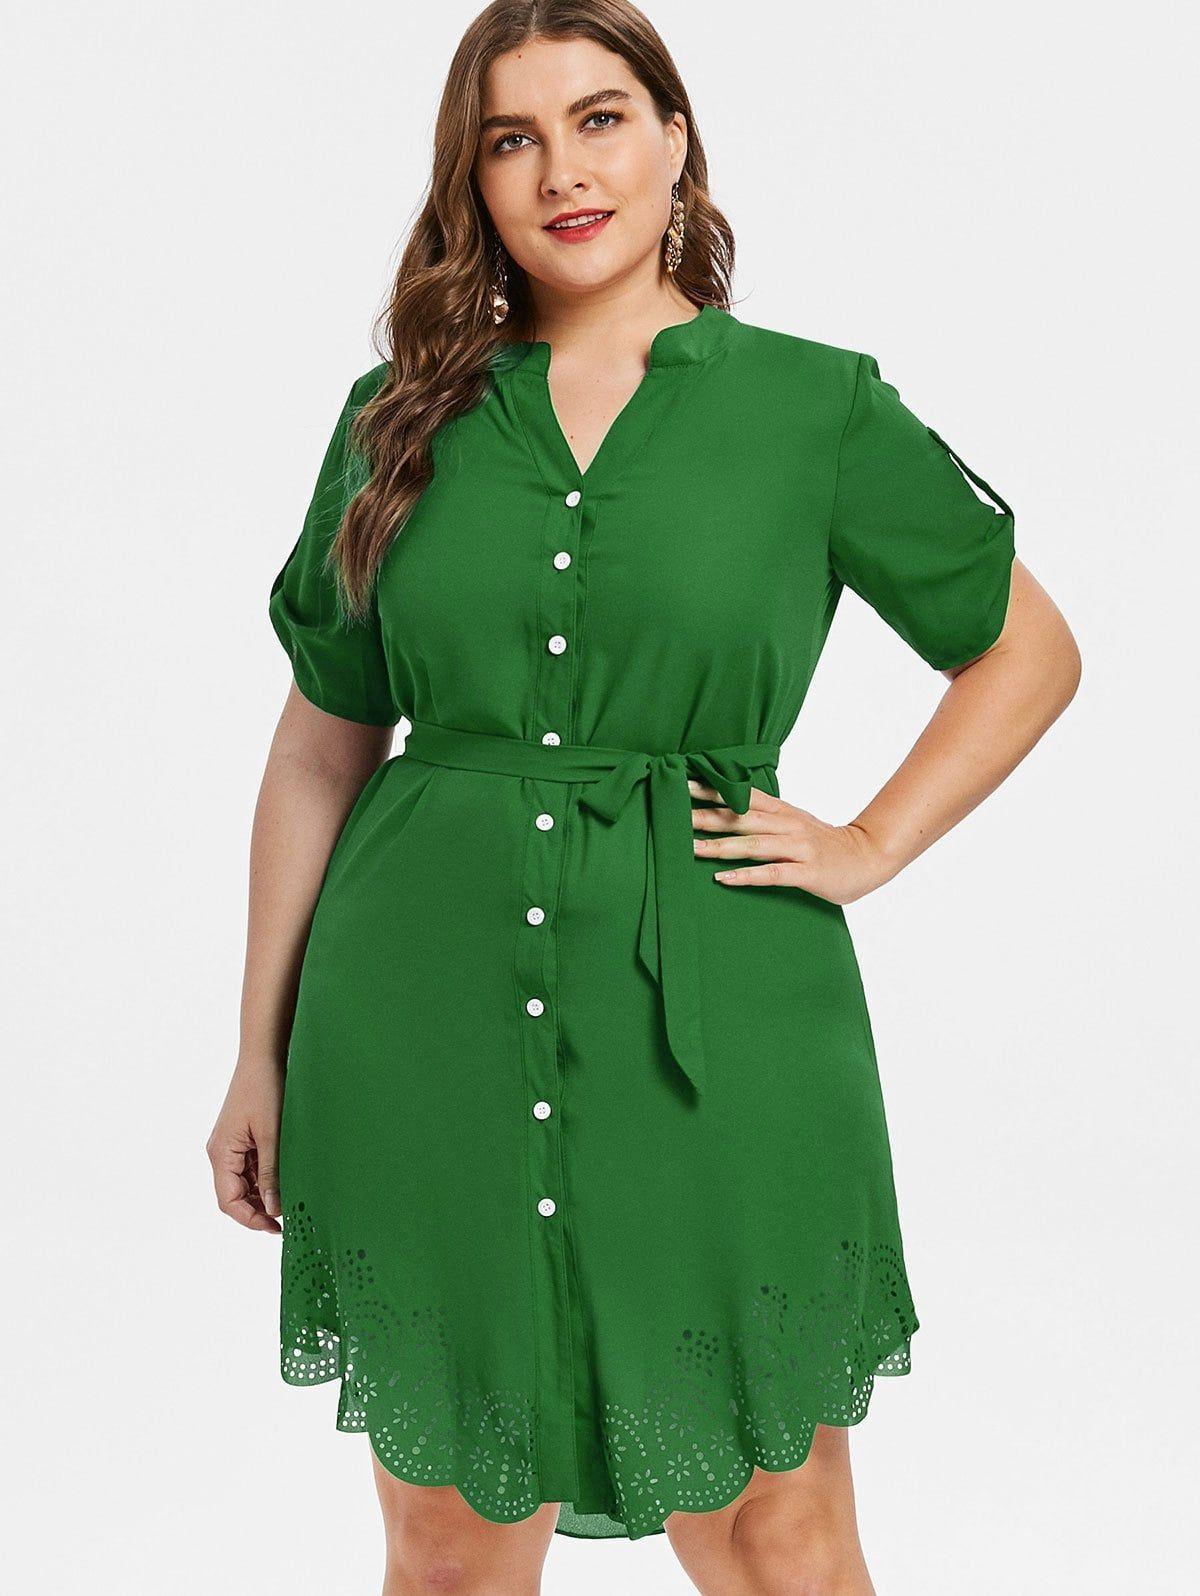 Plus Size Asymmetrical Shirt Dress - DEEP GREEN 4X | Clothes and ...